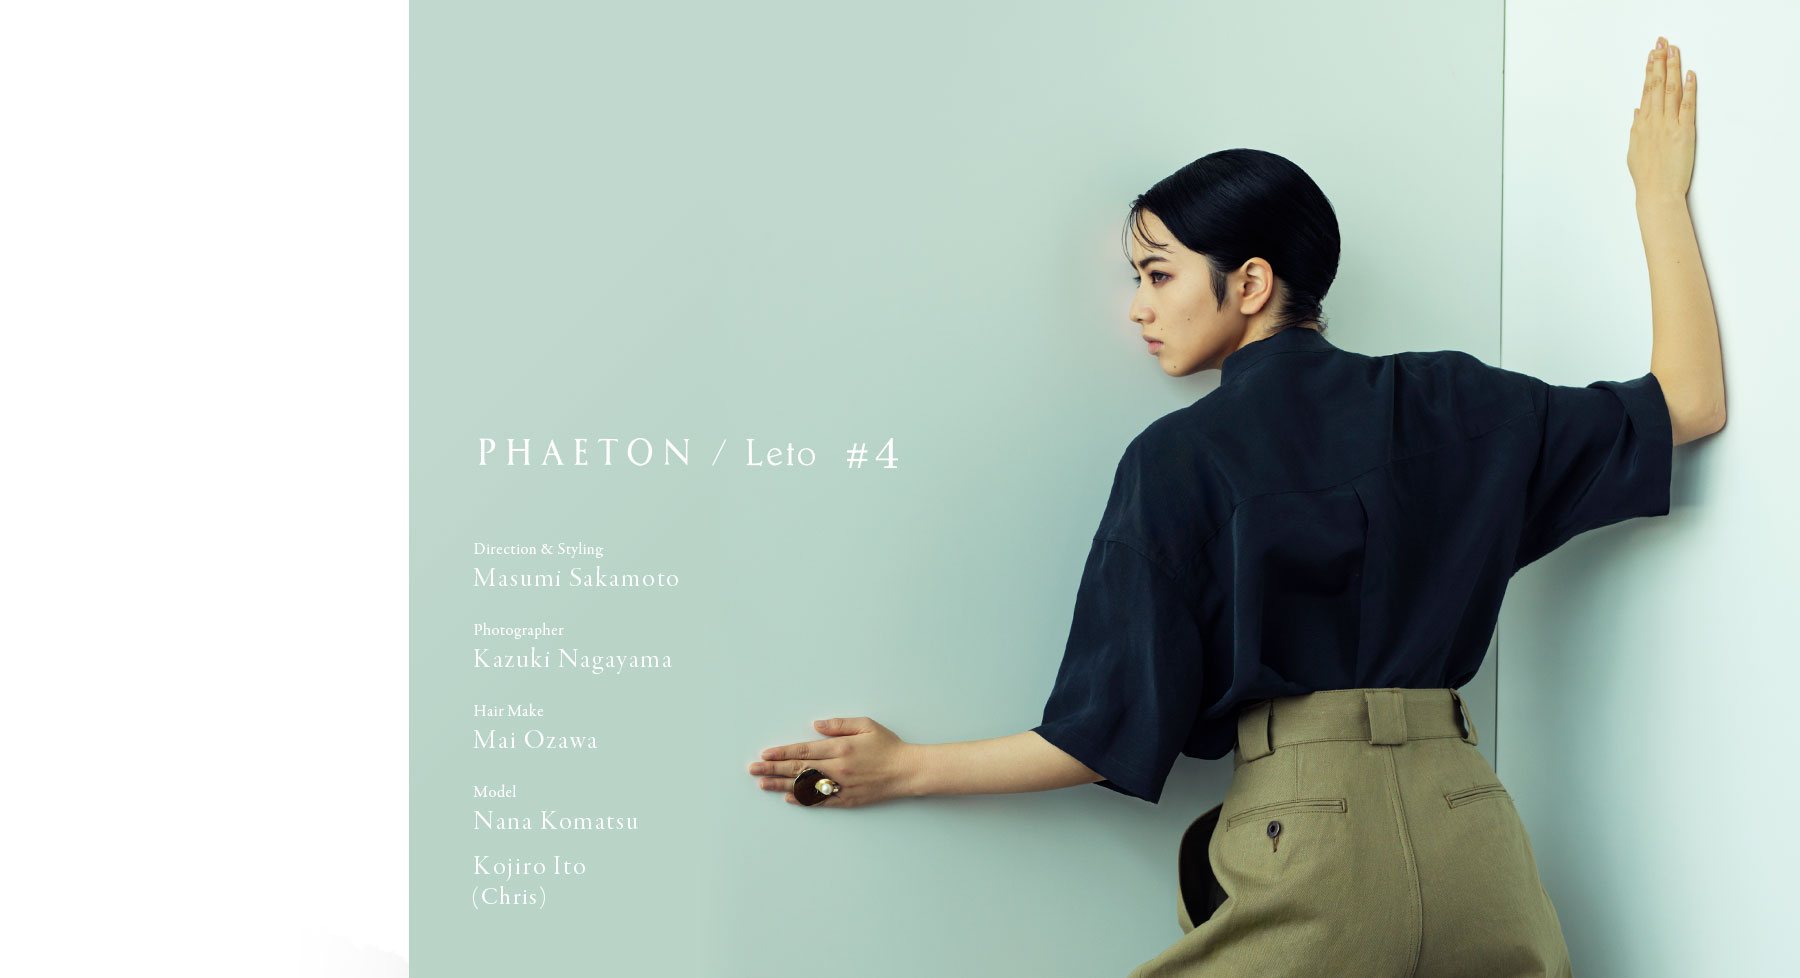 PHAETON BOOK #4